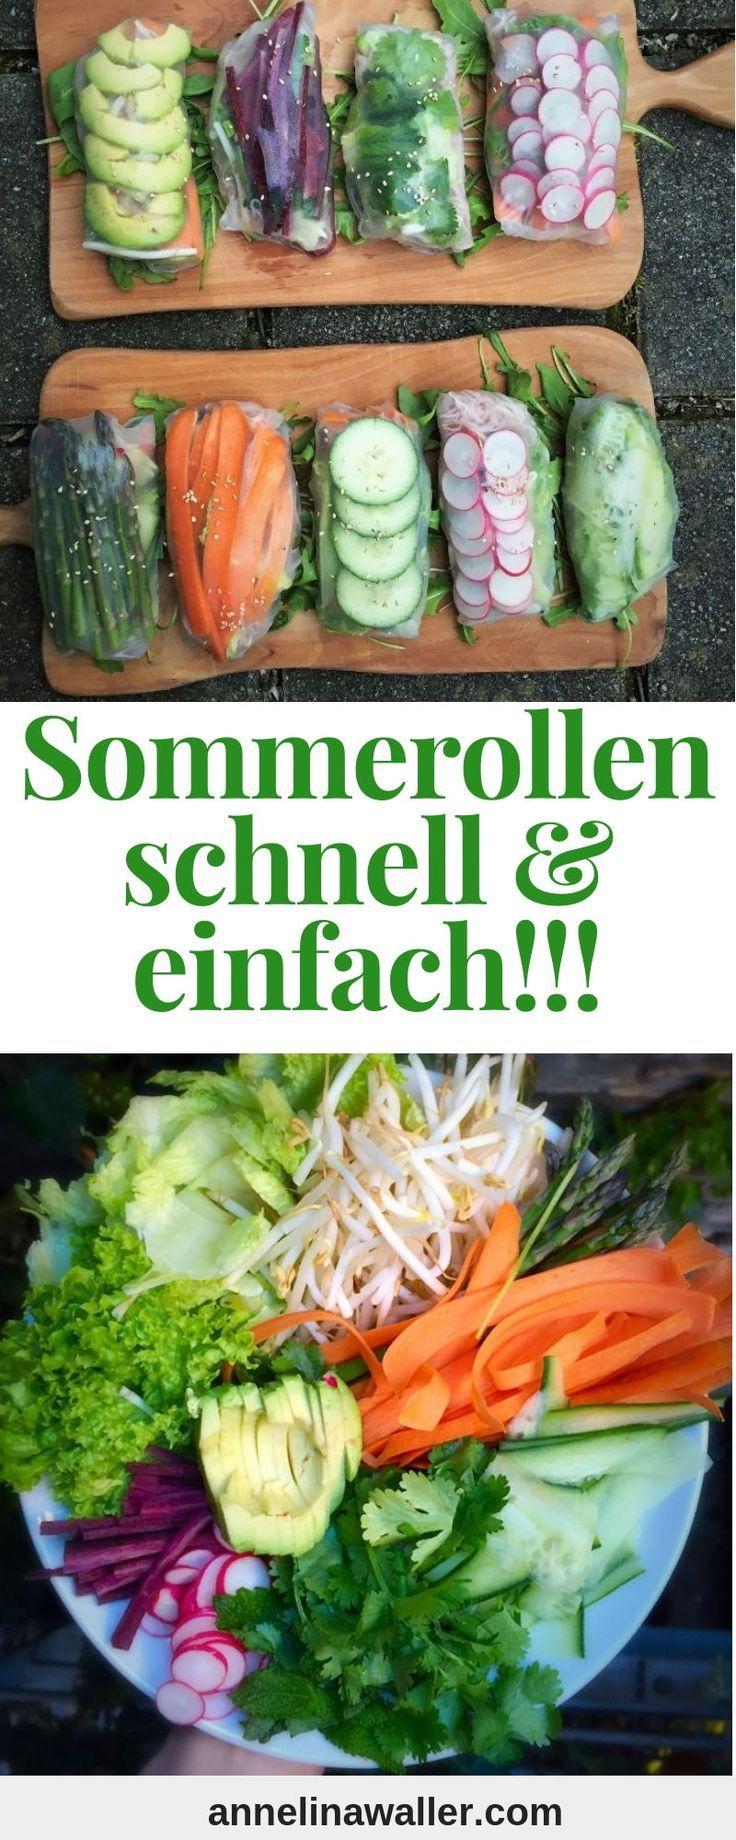 74989a843a2cf2894aed75bb5eb1e5bf - Vegane Rezepte Schnell